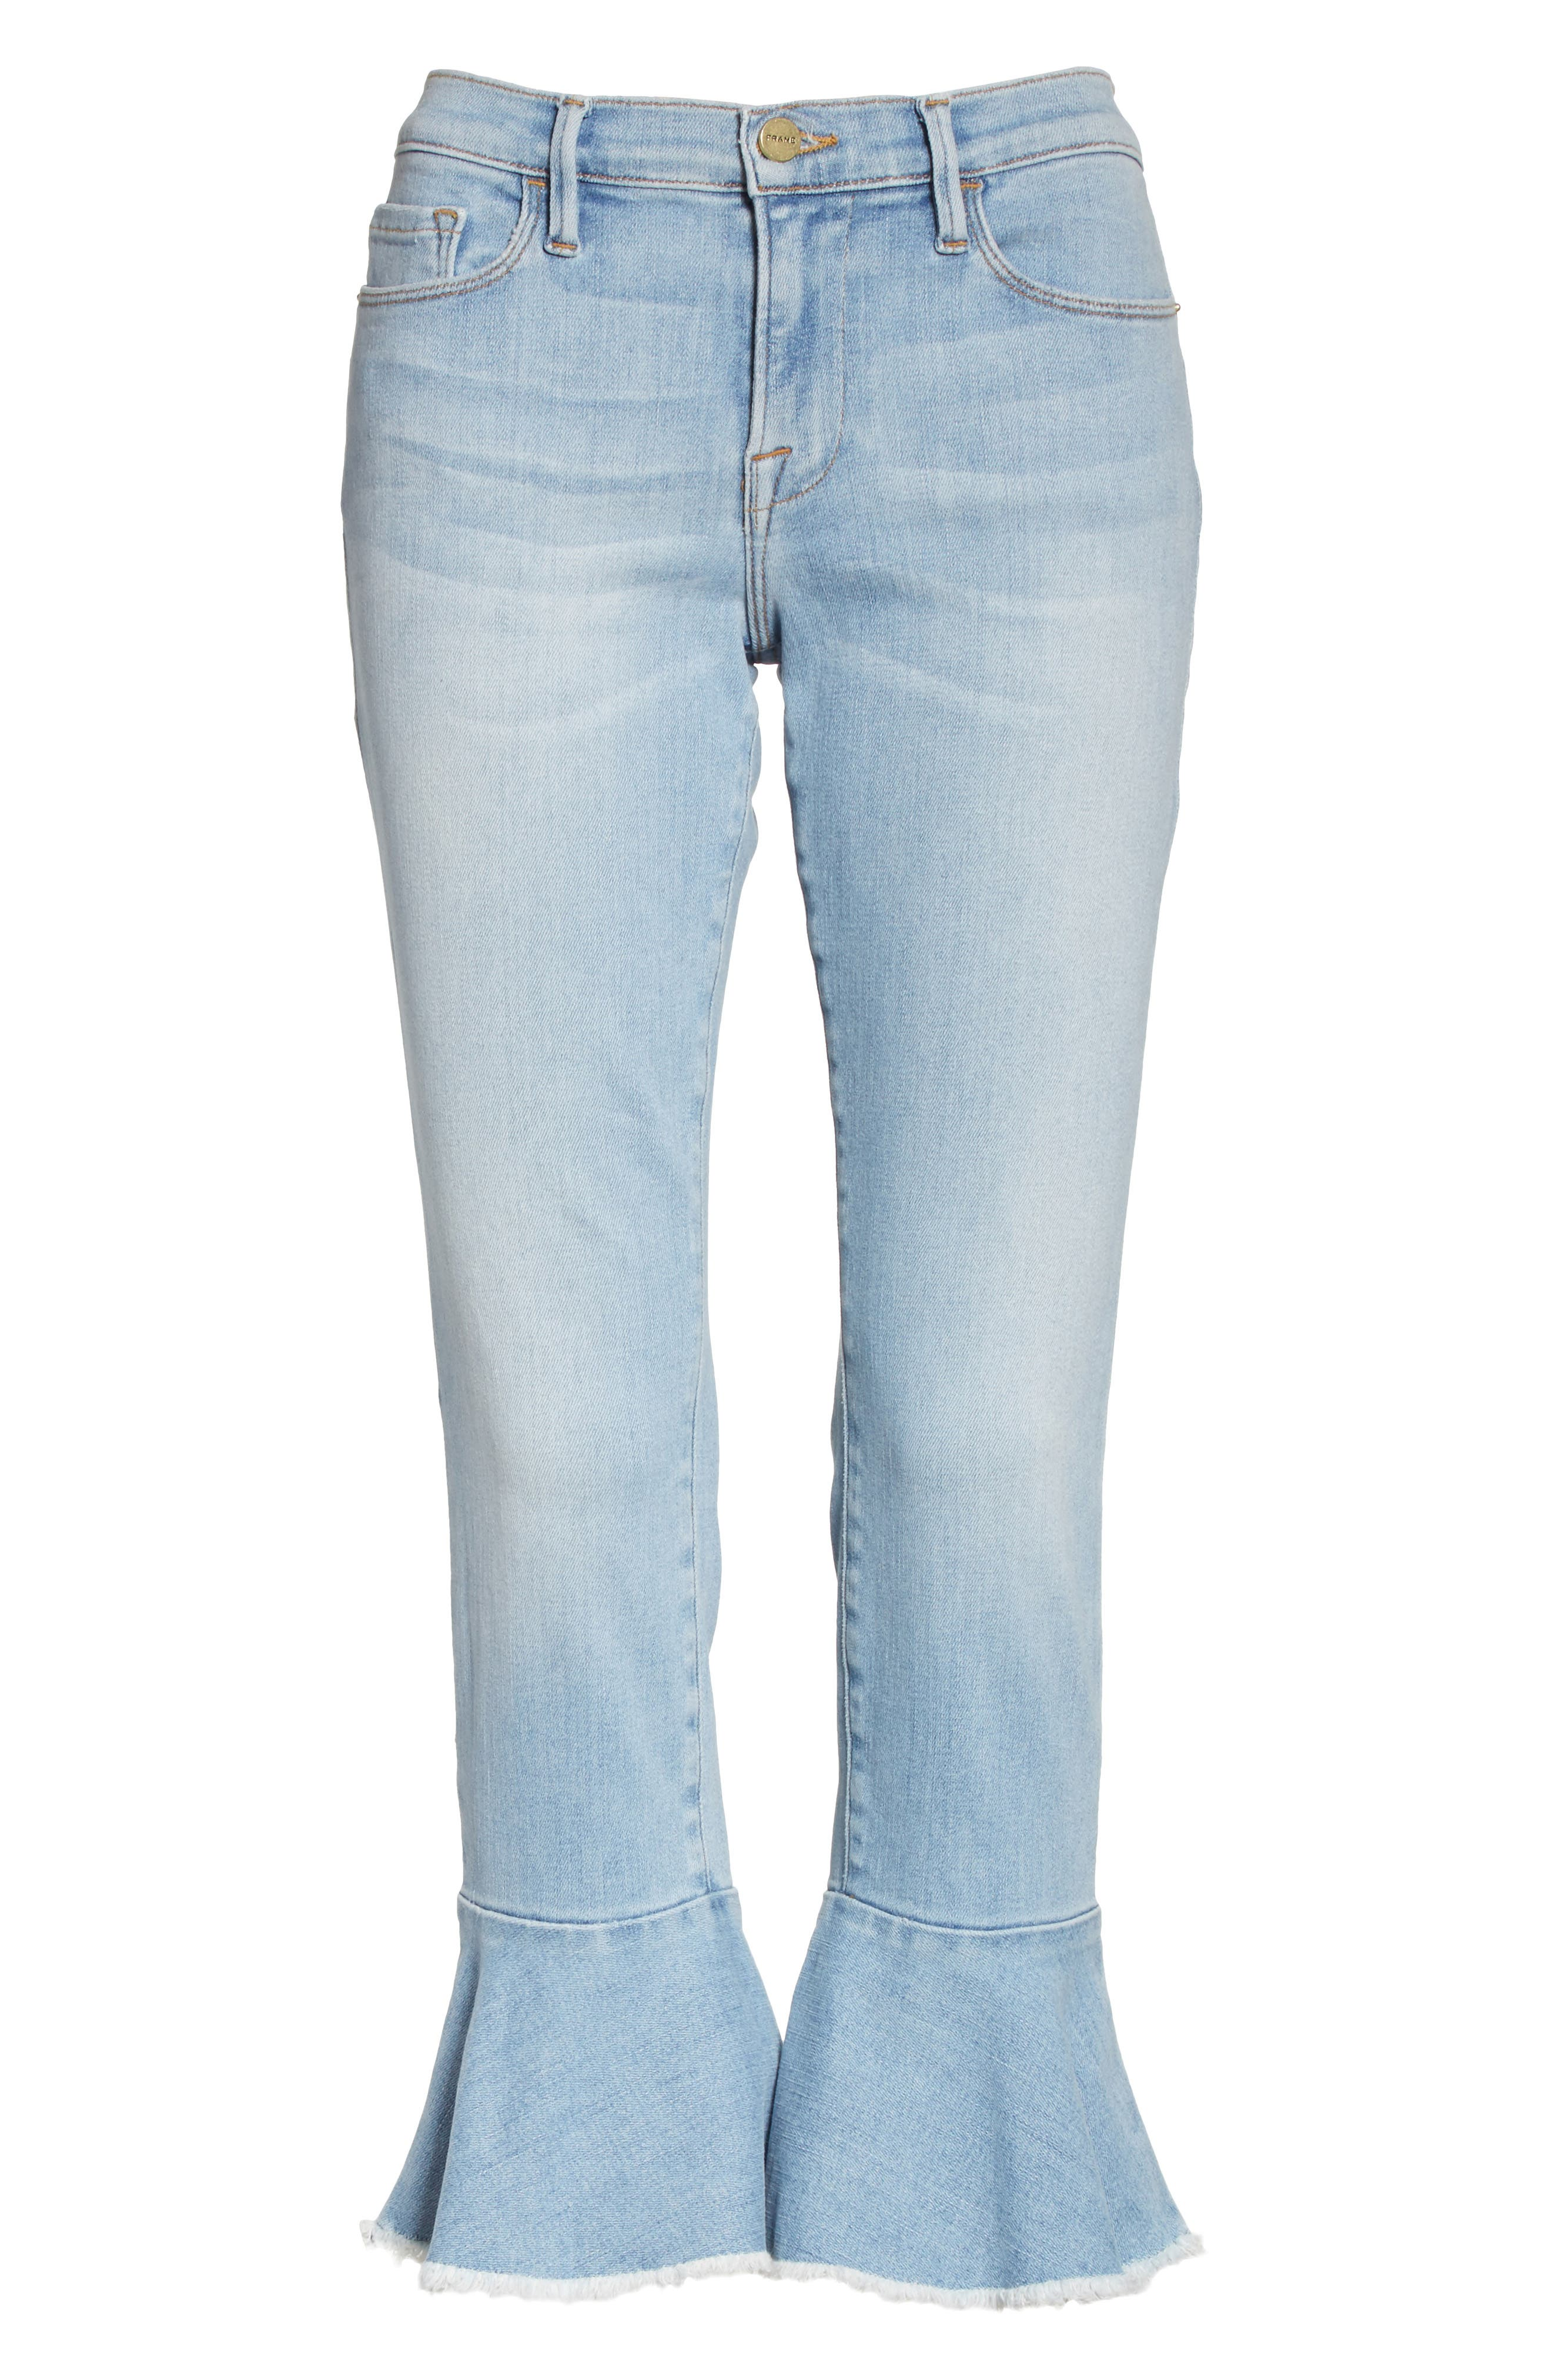 Le Skinny de Jeanne Flounce Skinny Jeans,                             Alternate thumbnail 6, color,                             Limer Stone